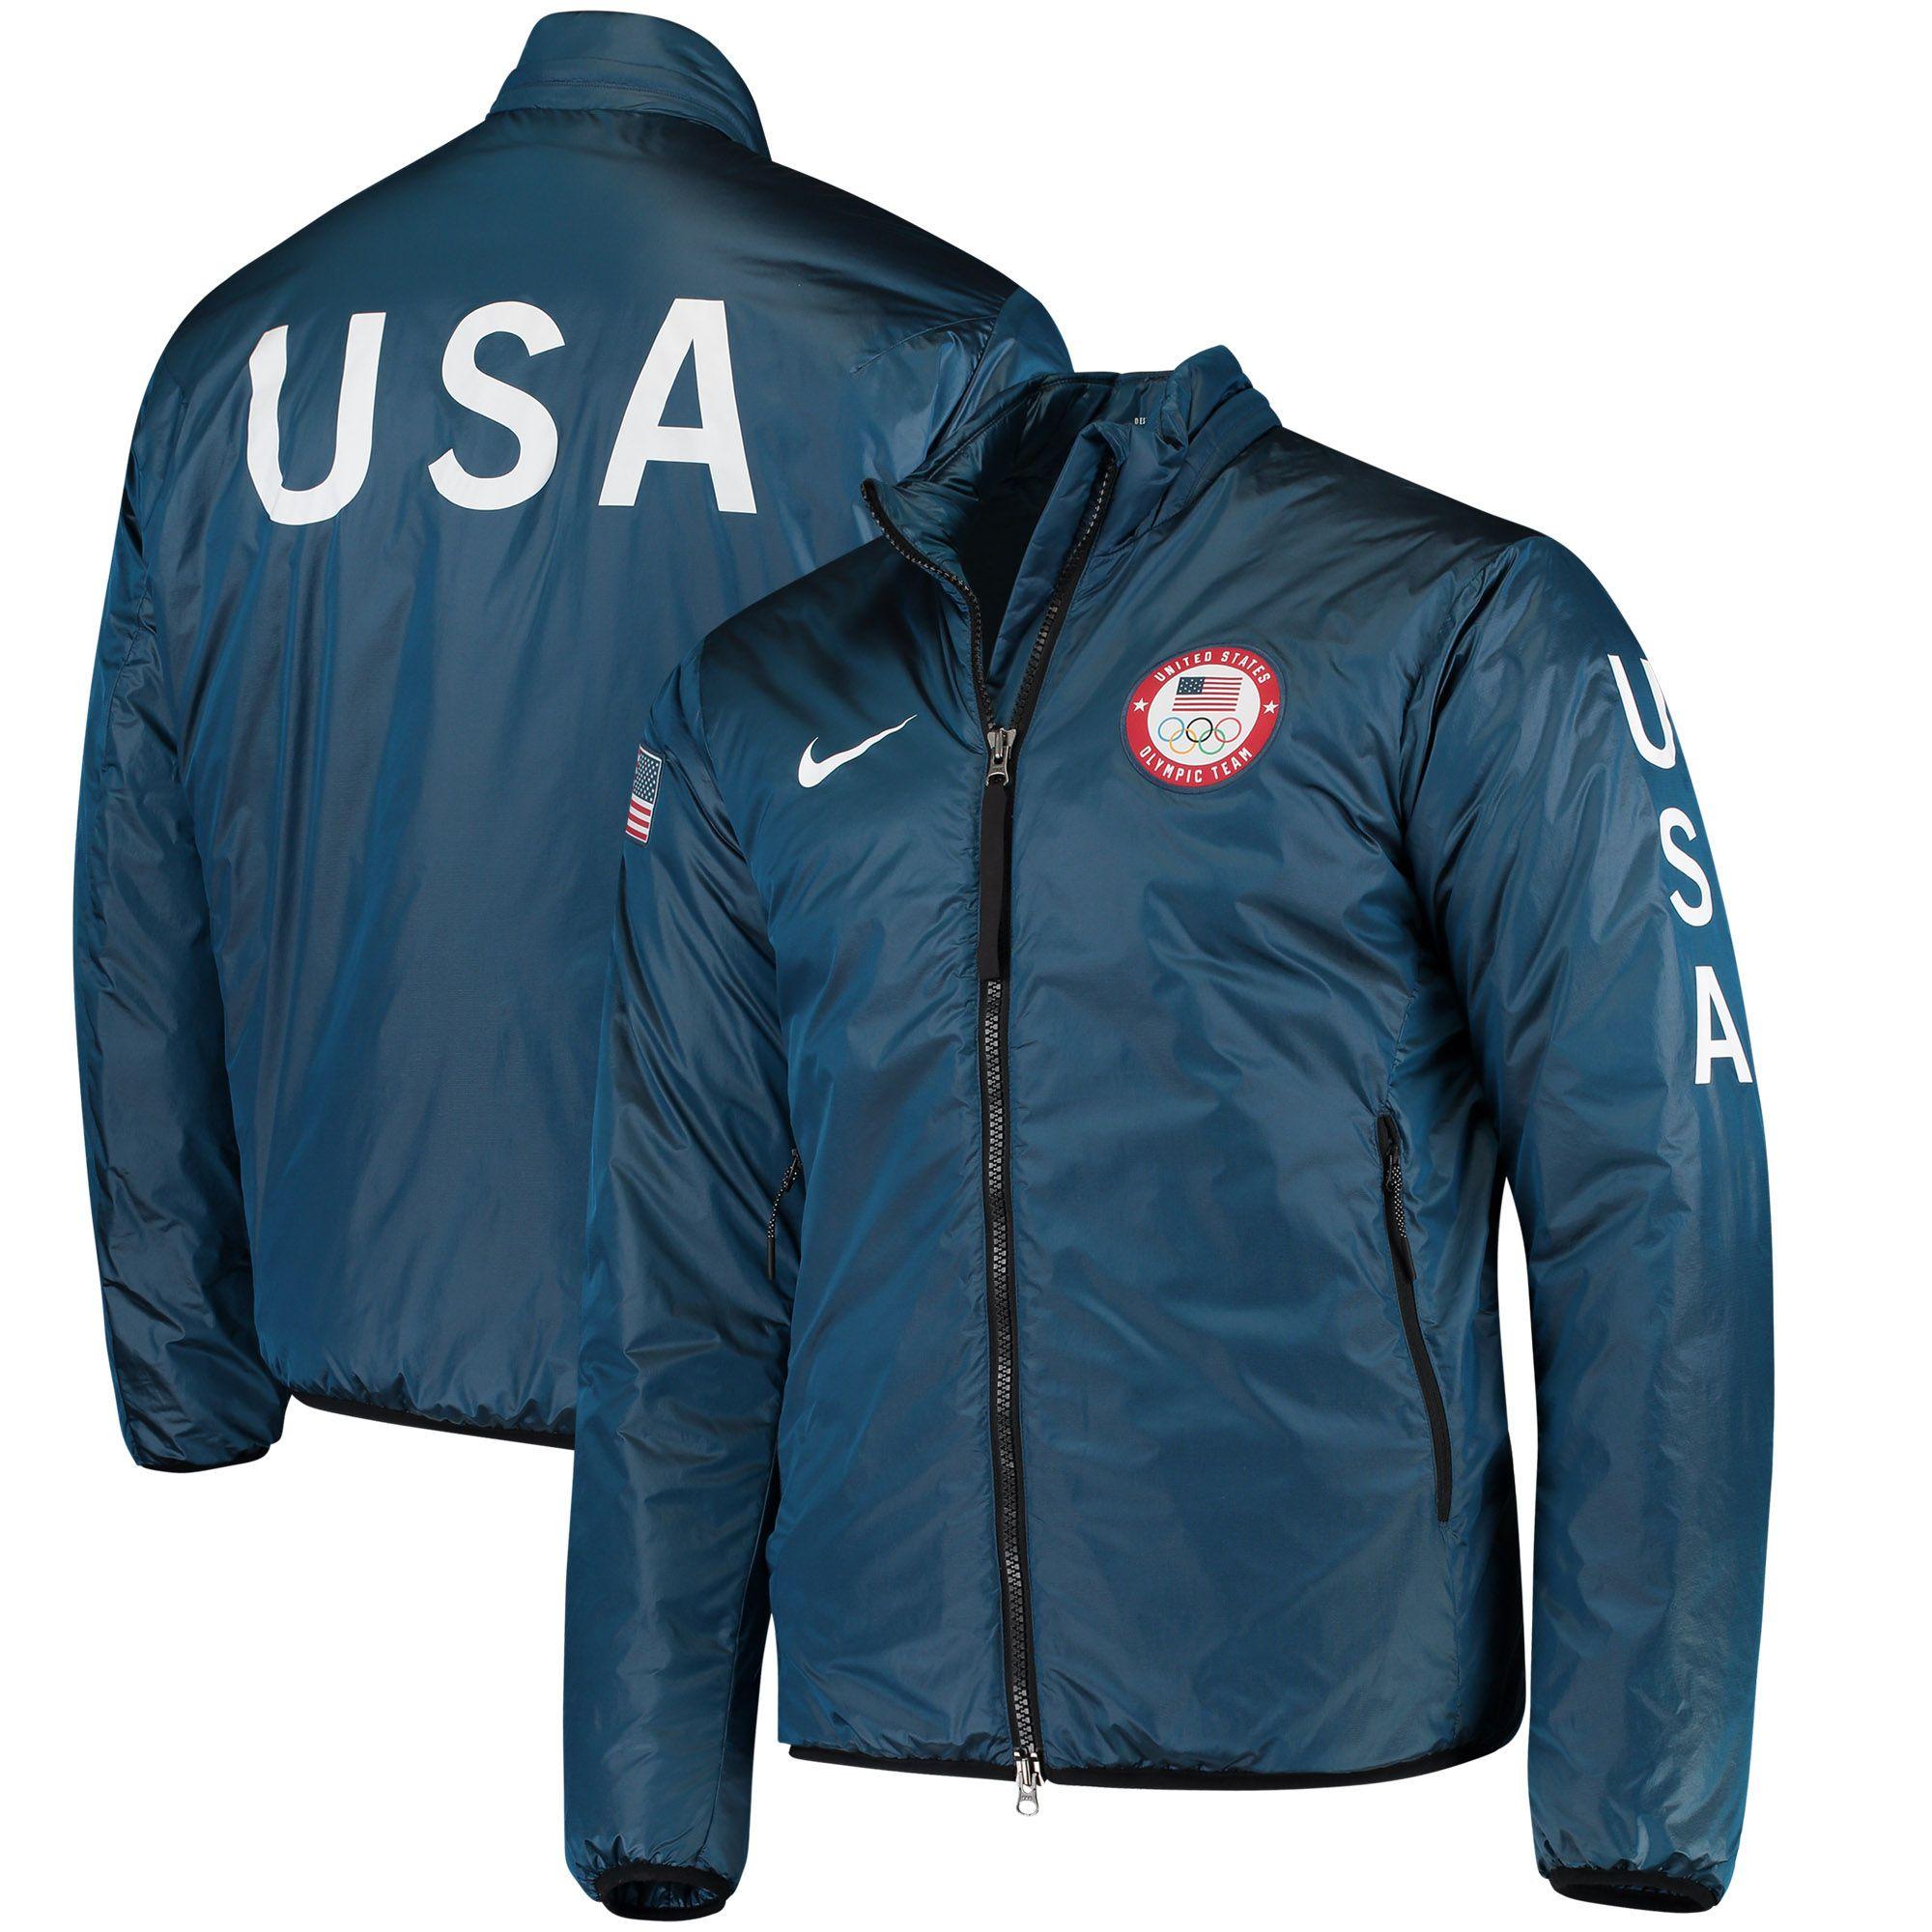 low priced b141b 83145 Team USA Nike Lab 2018 Olympics Midlayer Jacket – Blue ...